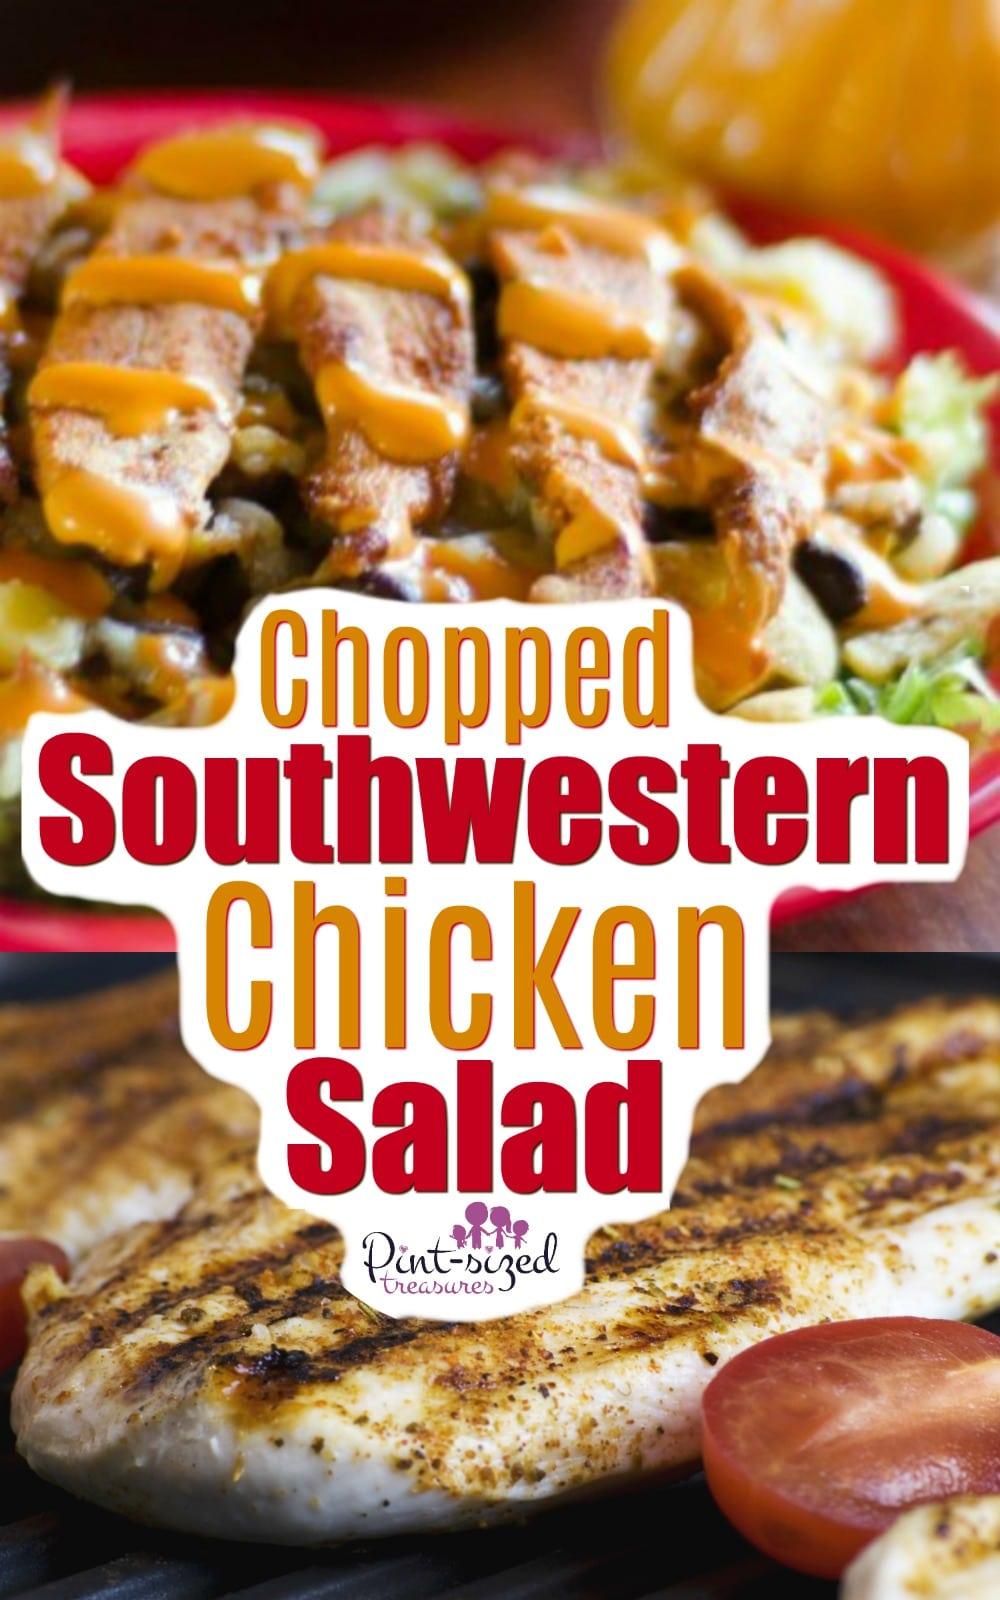 Easy Southwestern Chopped Chicken Salad Recipe